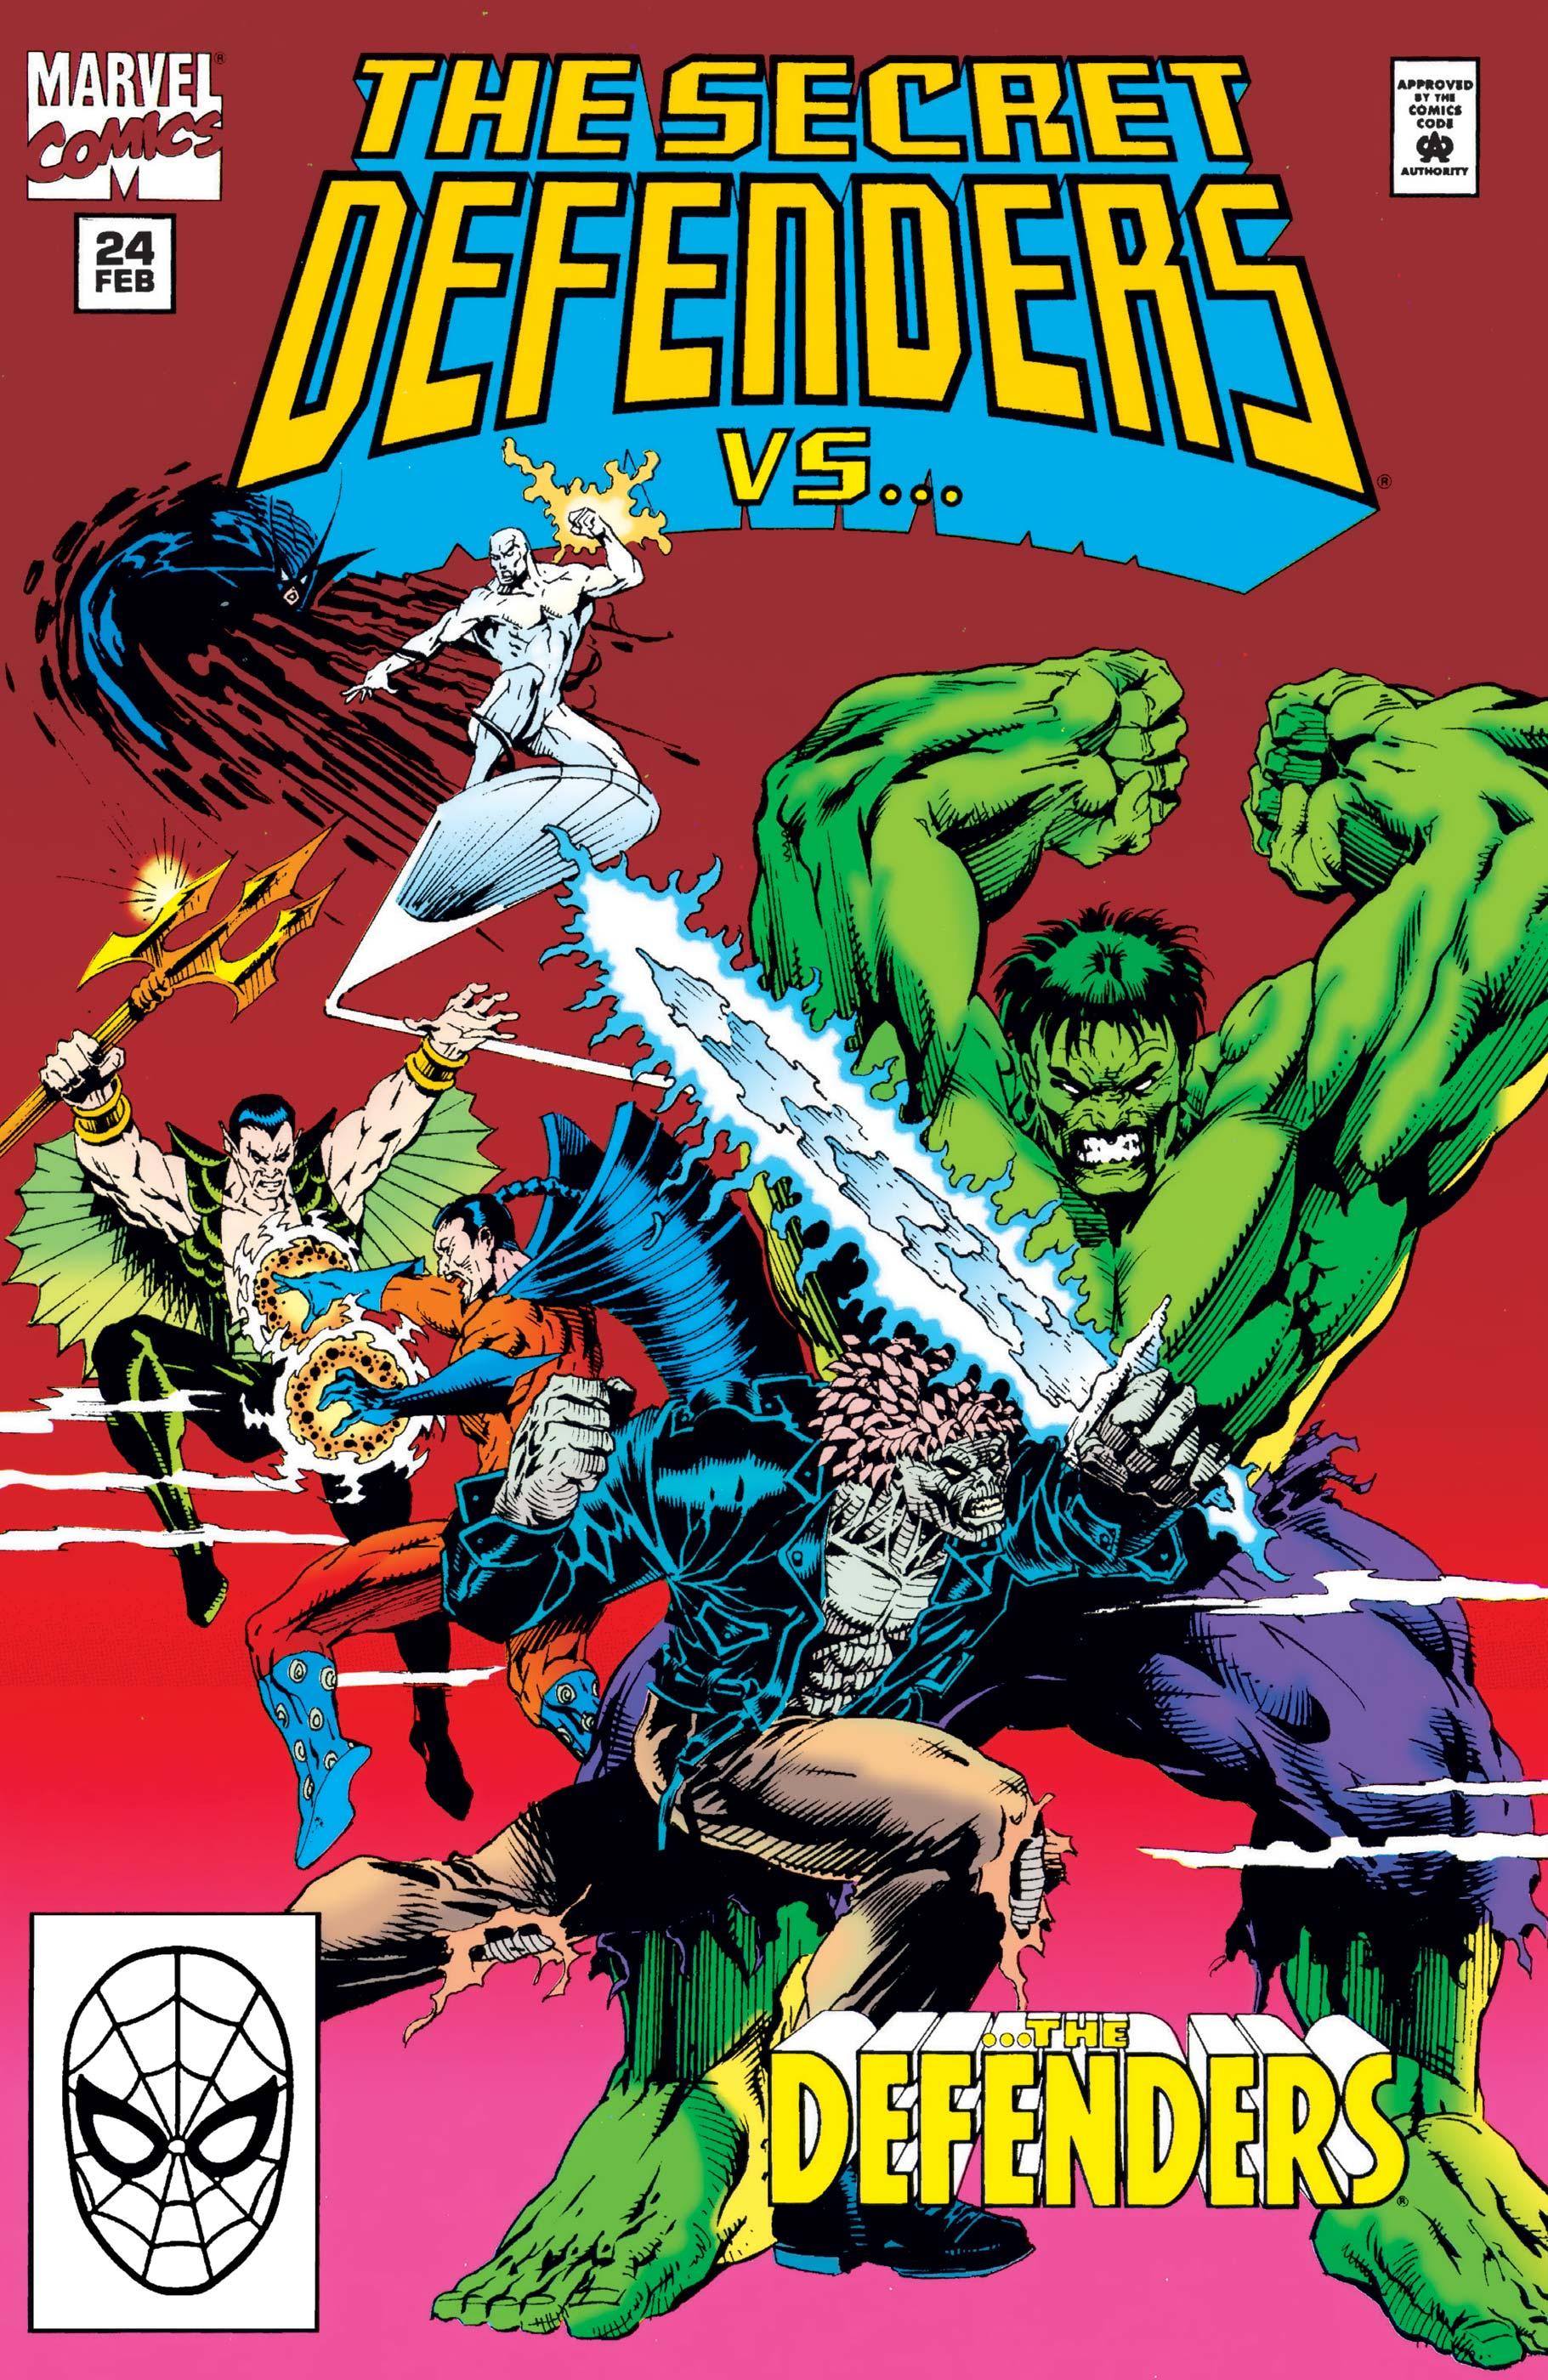 Secret Defenders (1993) #24